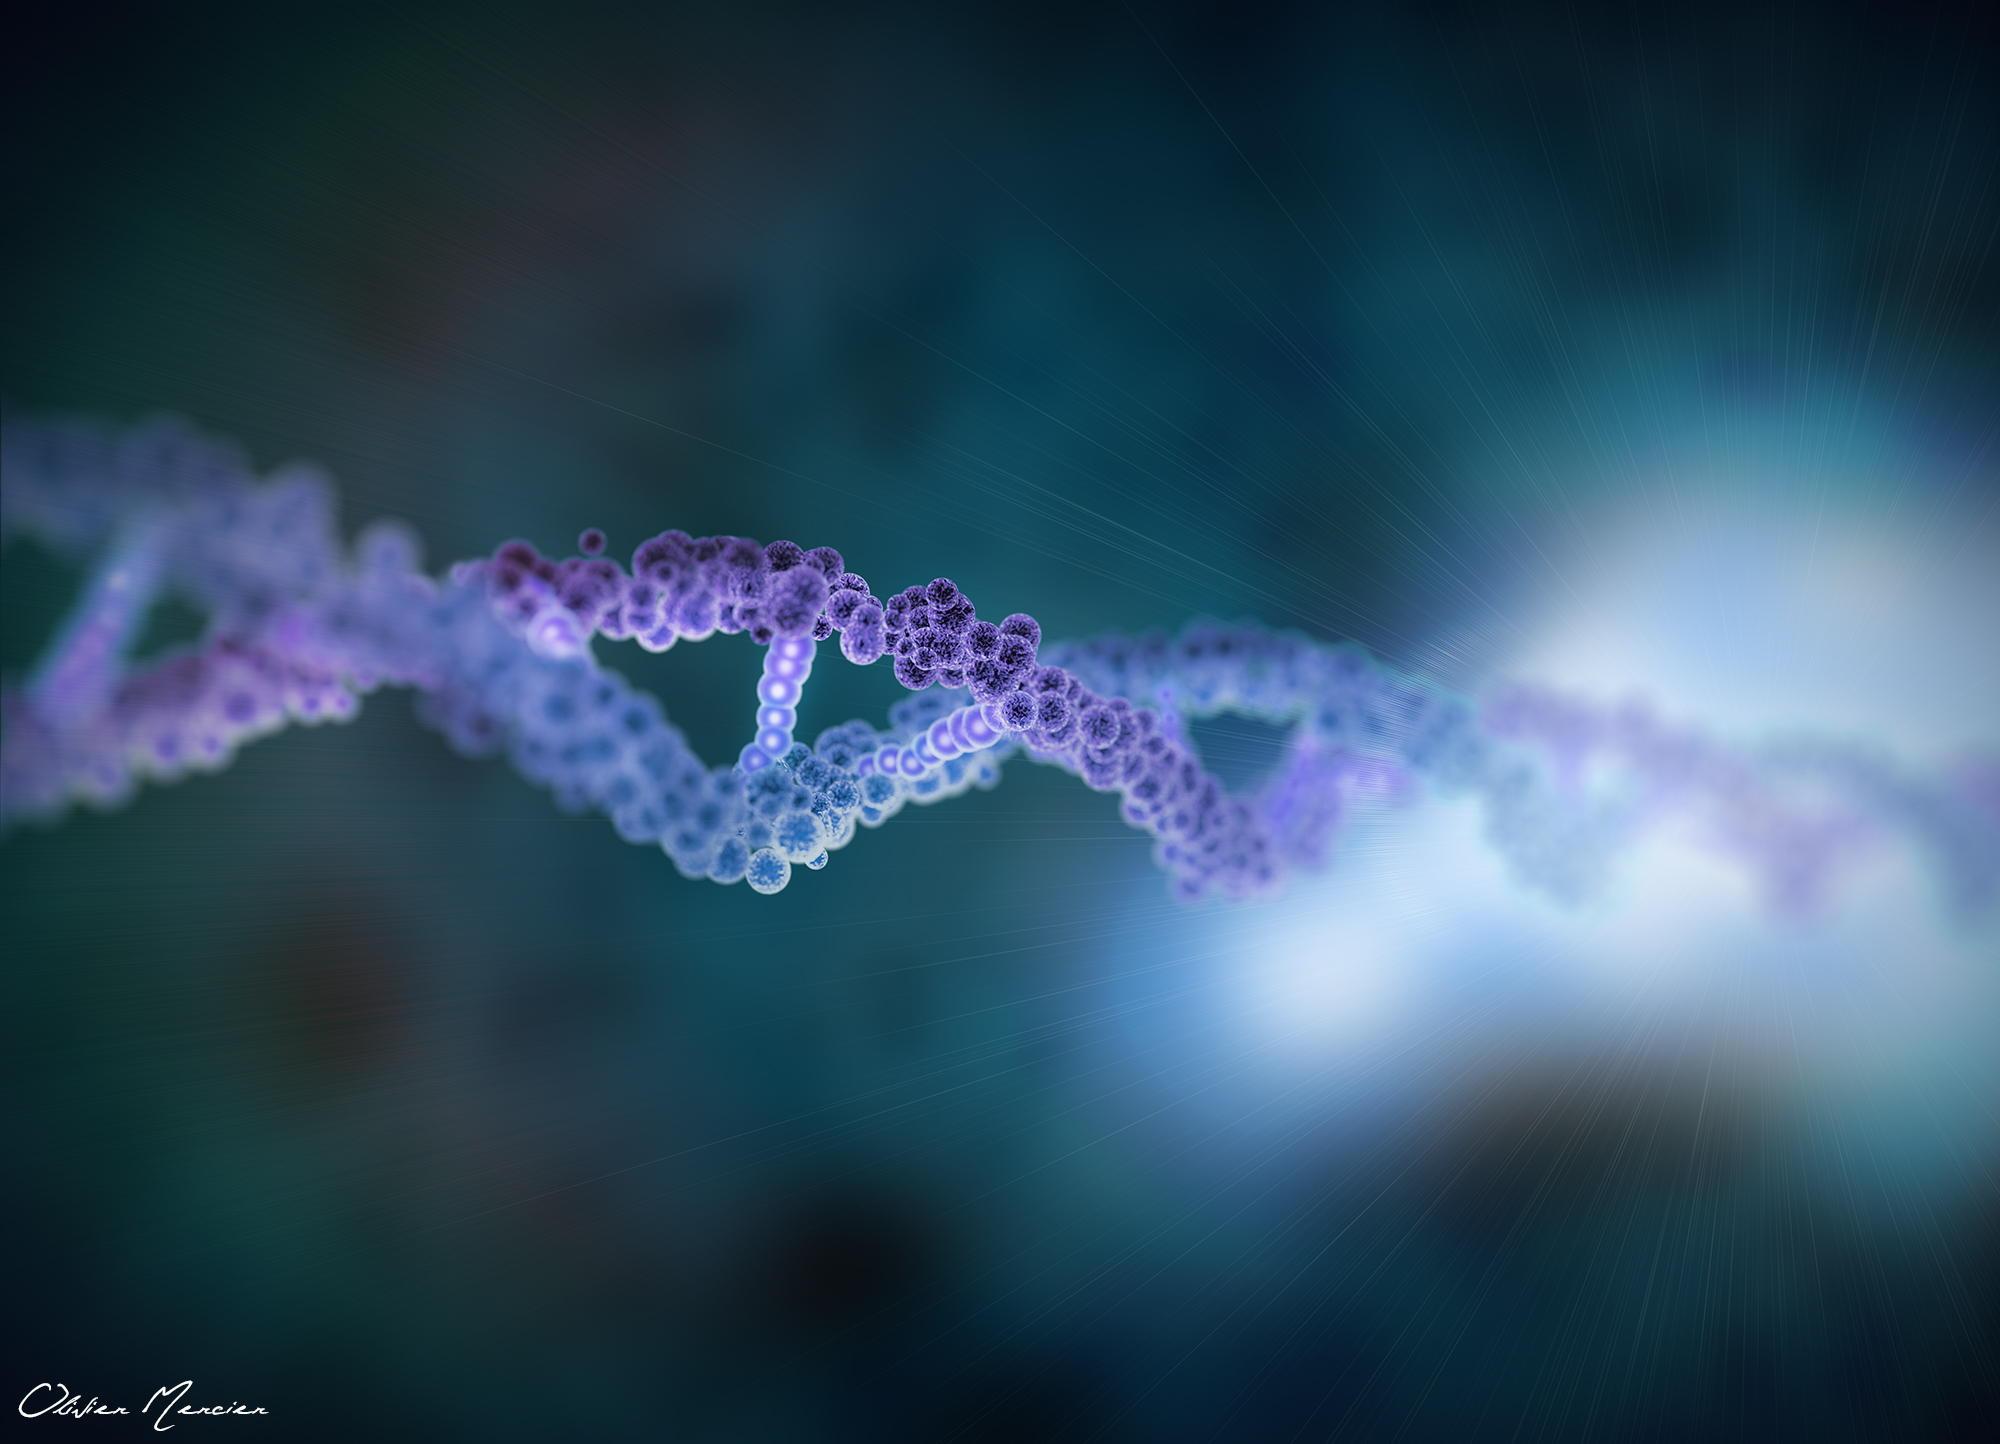 ncRNA(非编码RNA)专项基金课题